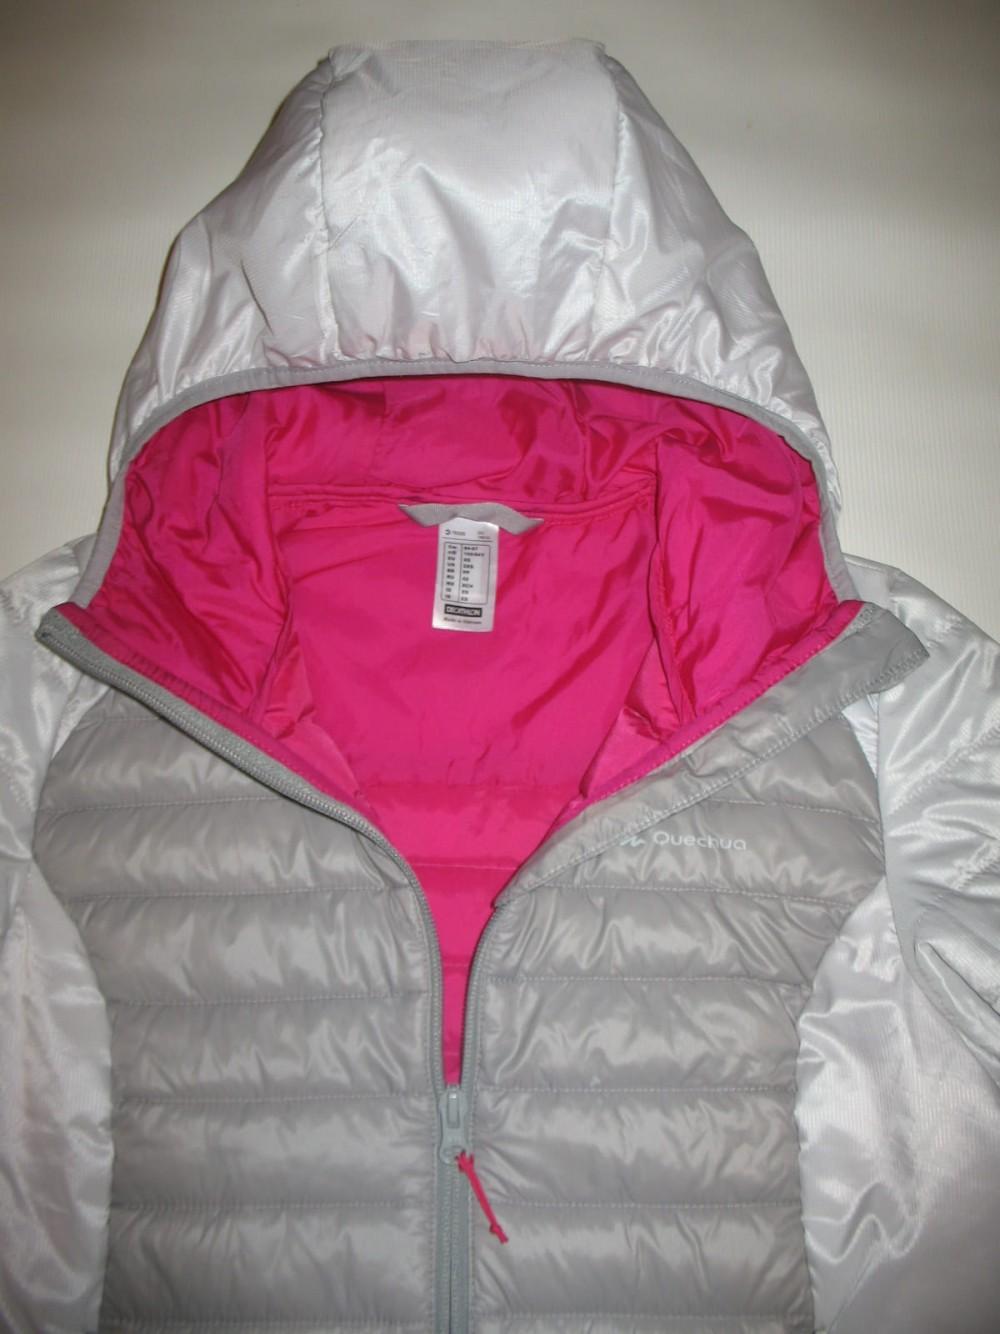 Куртка QUECHUA X-light down jacket lady (размер XS) - 4